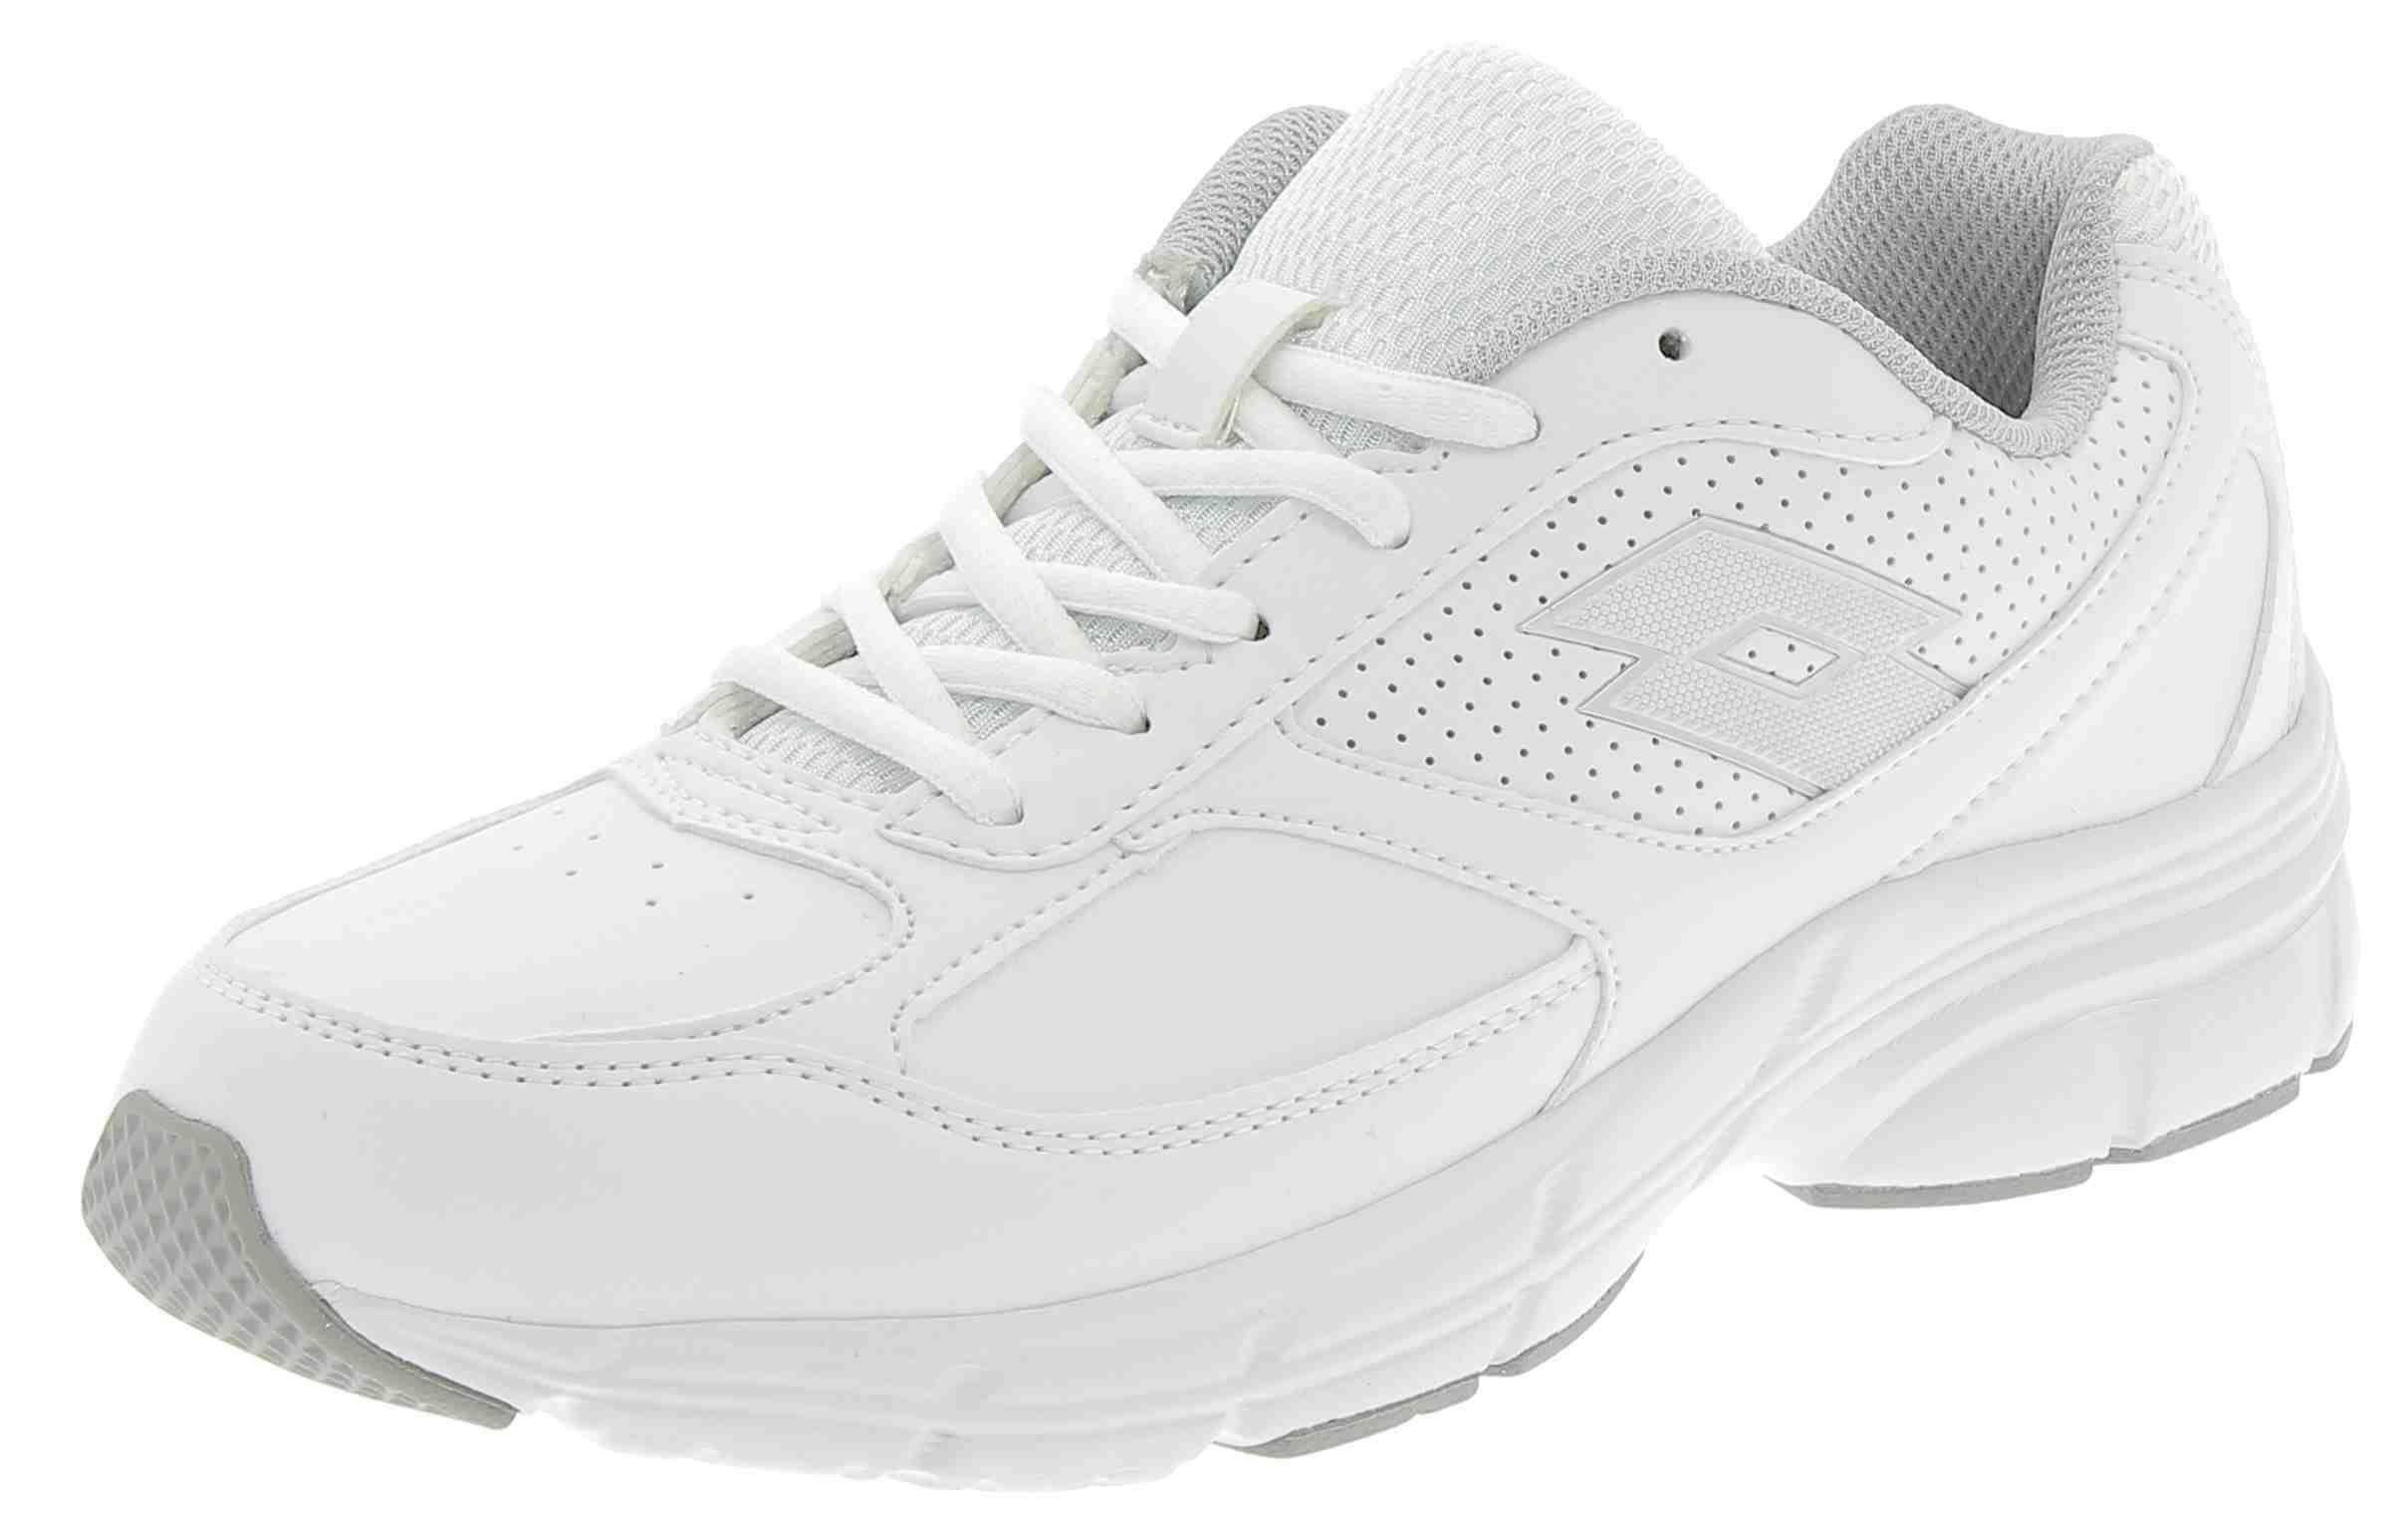 ireland lotto white shoes 3918f cc1ae